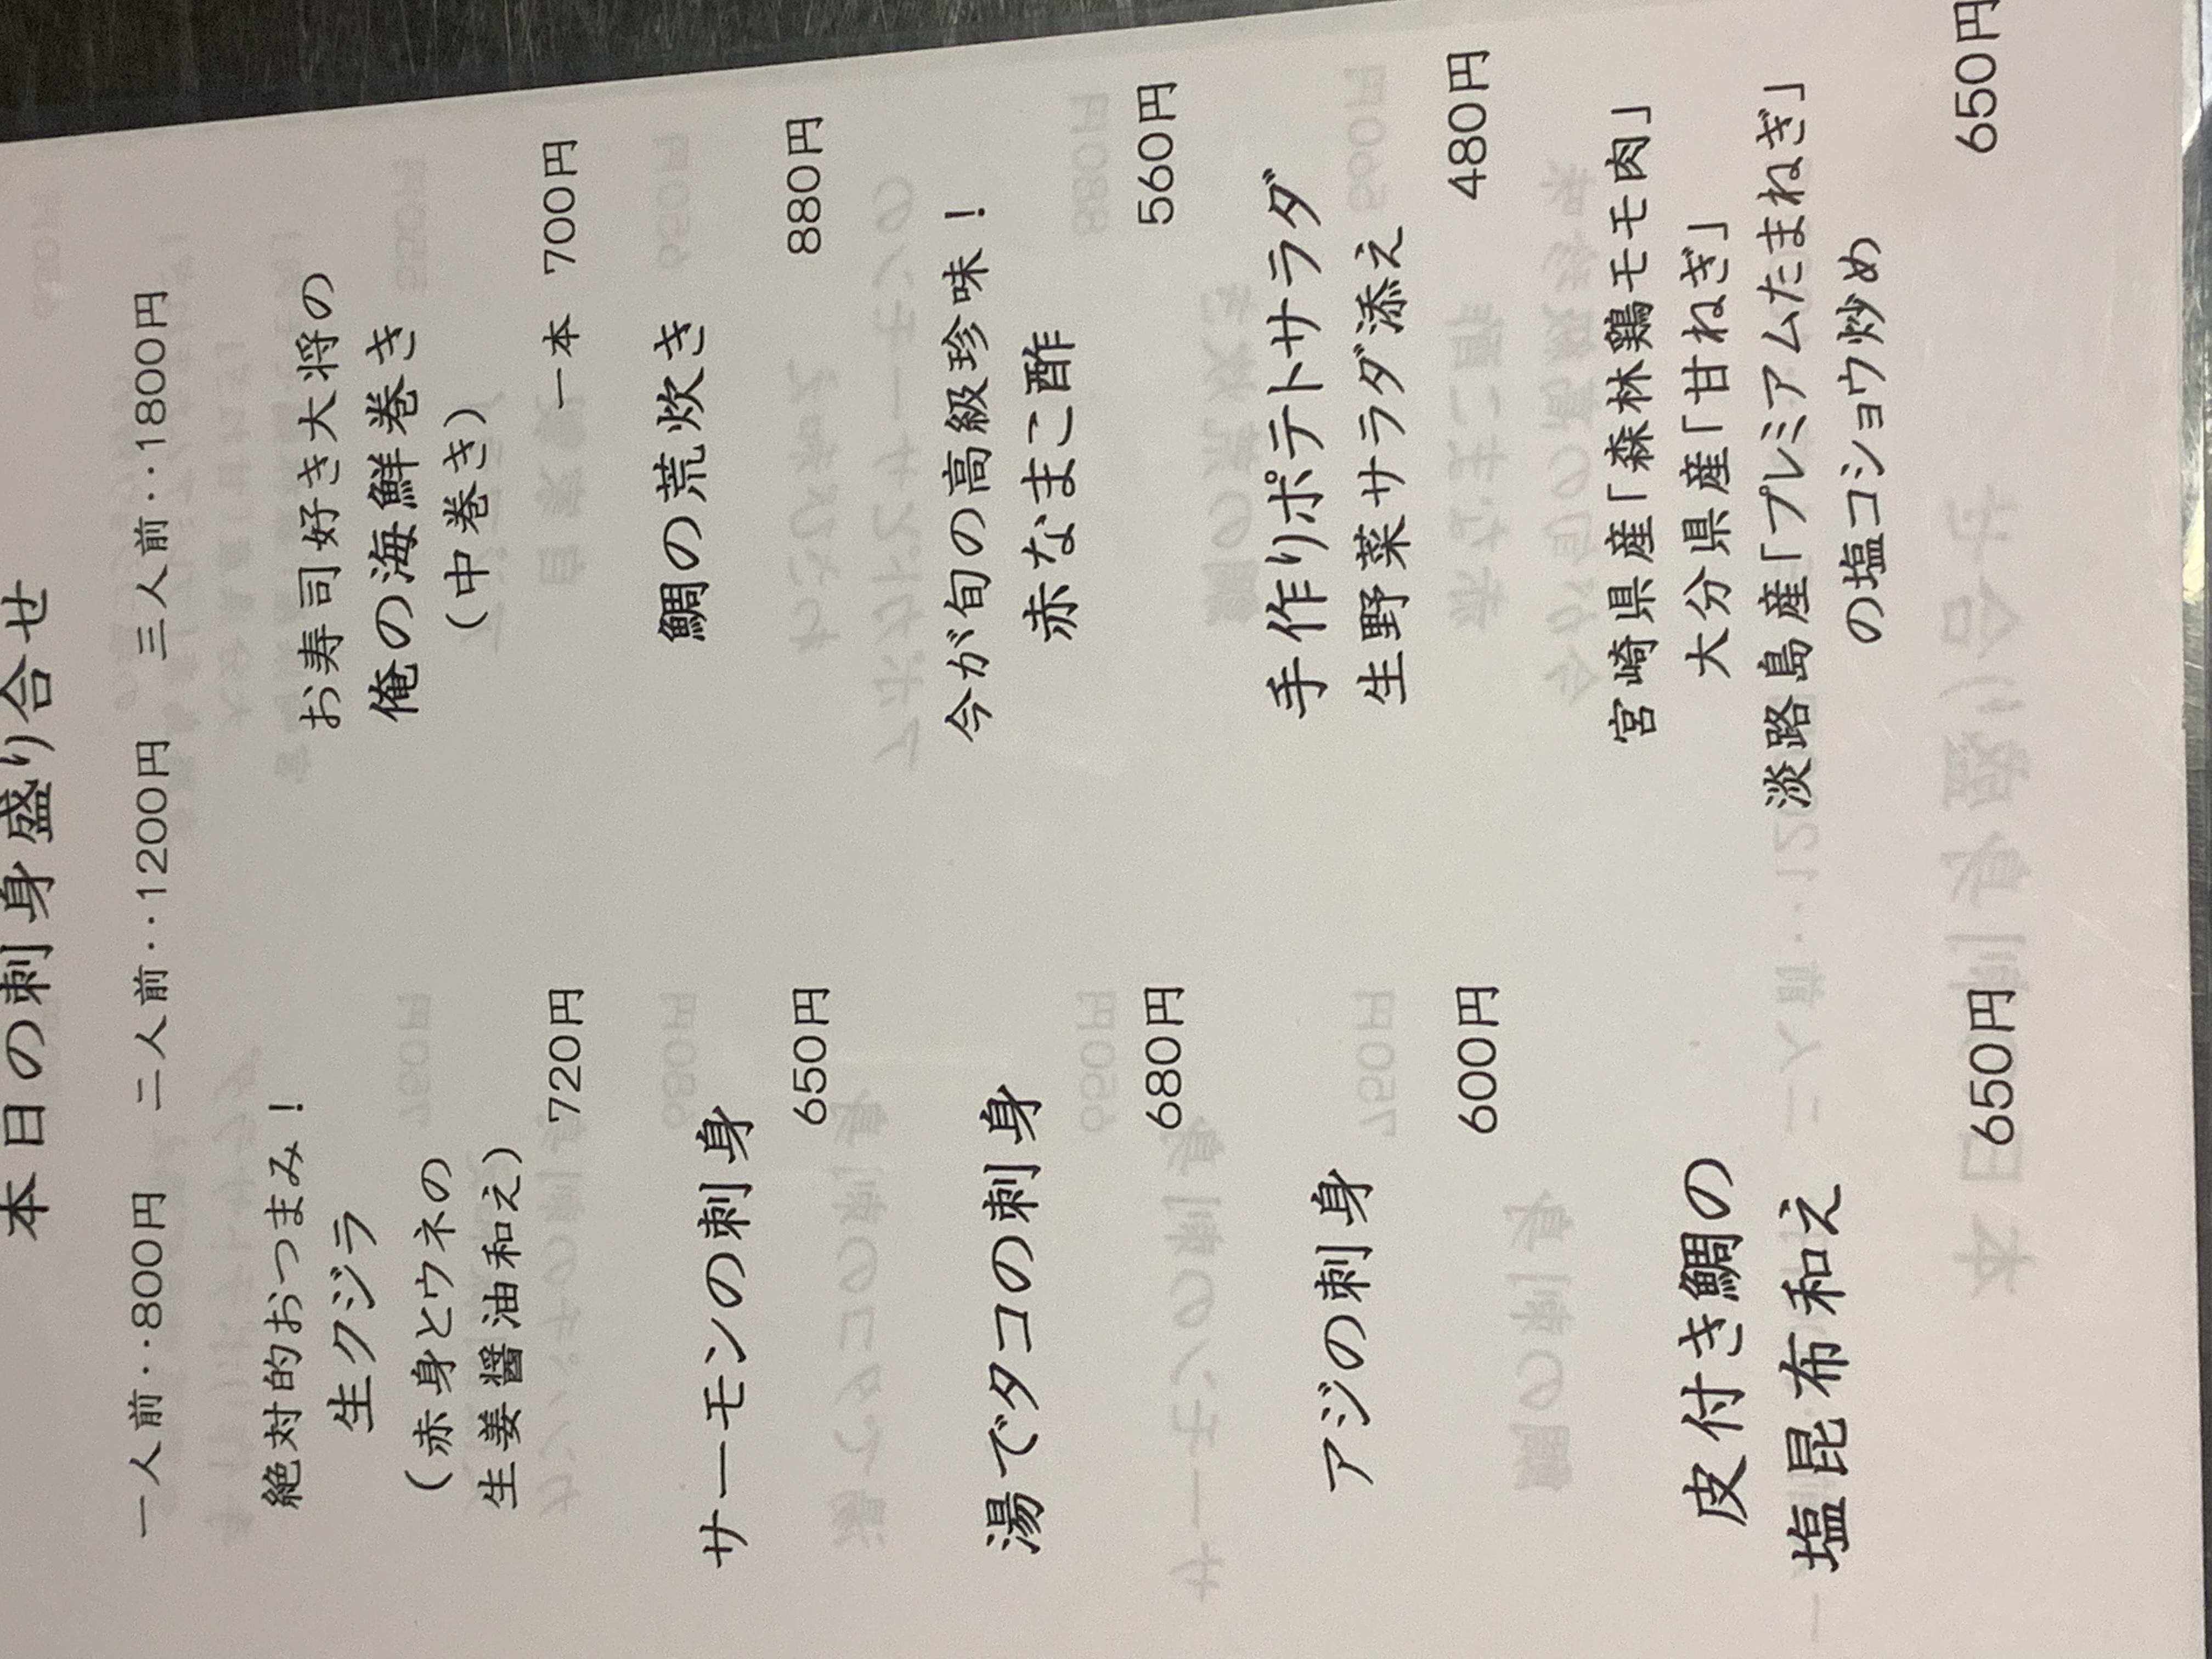 CDEEFBBE-C856-4408-BE1C-31346324F21F